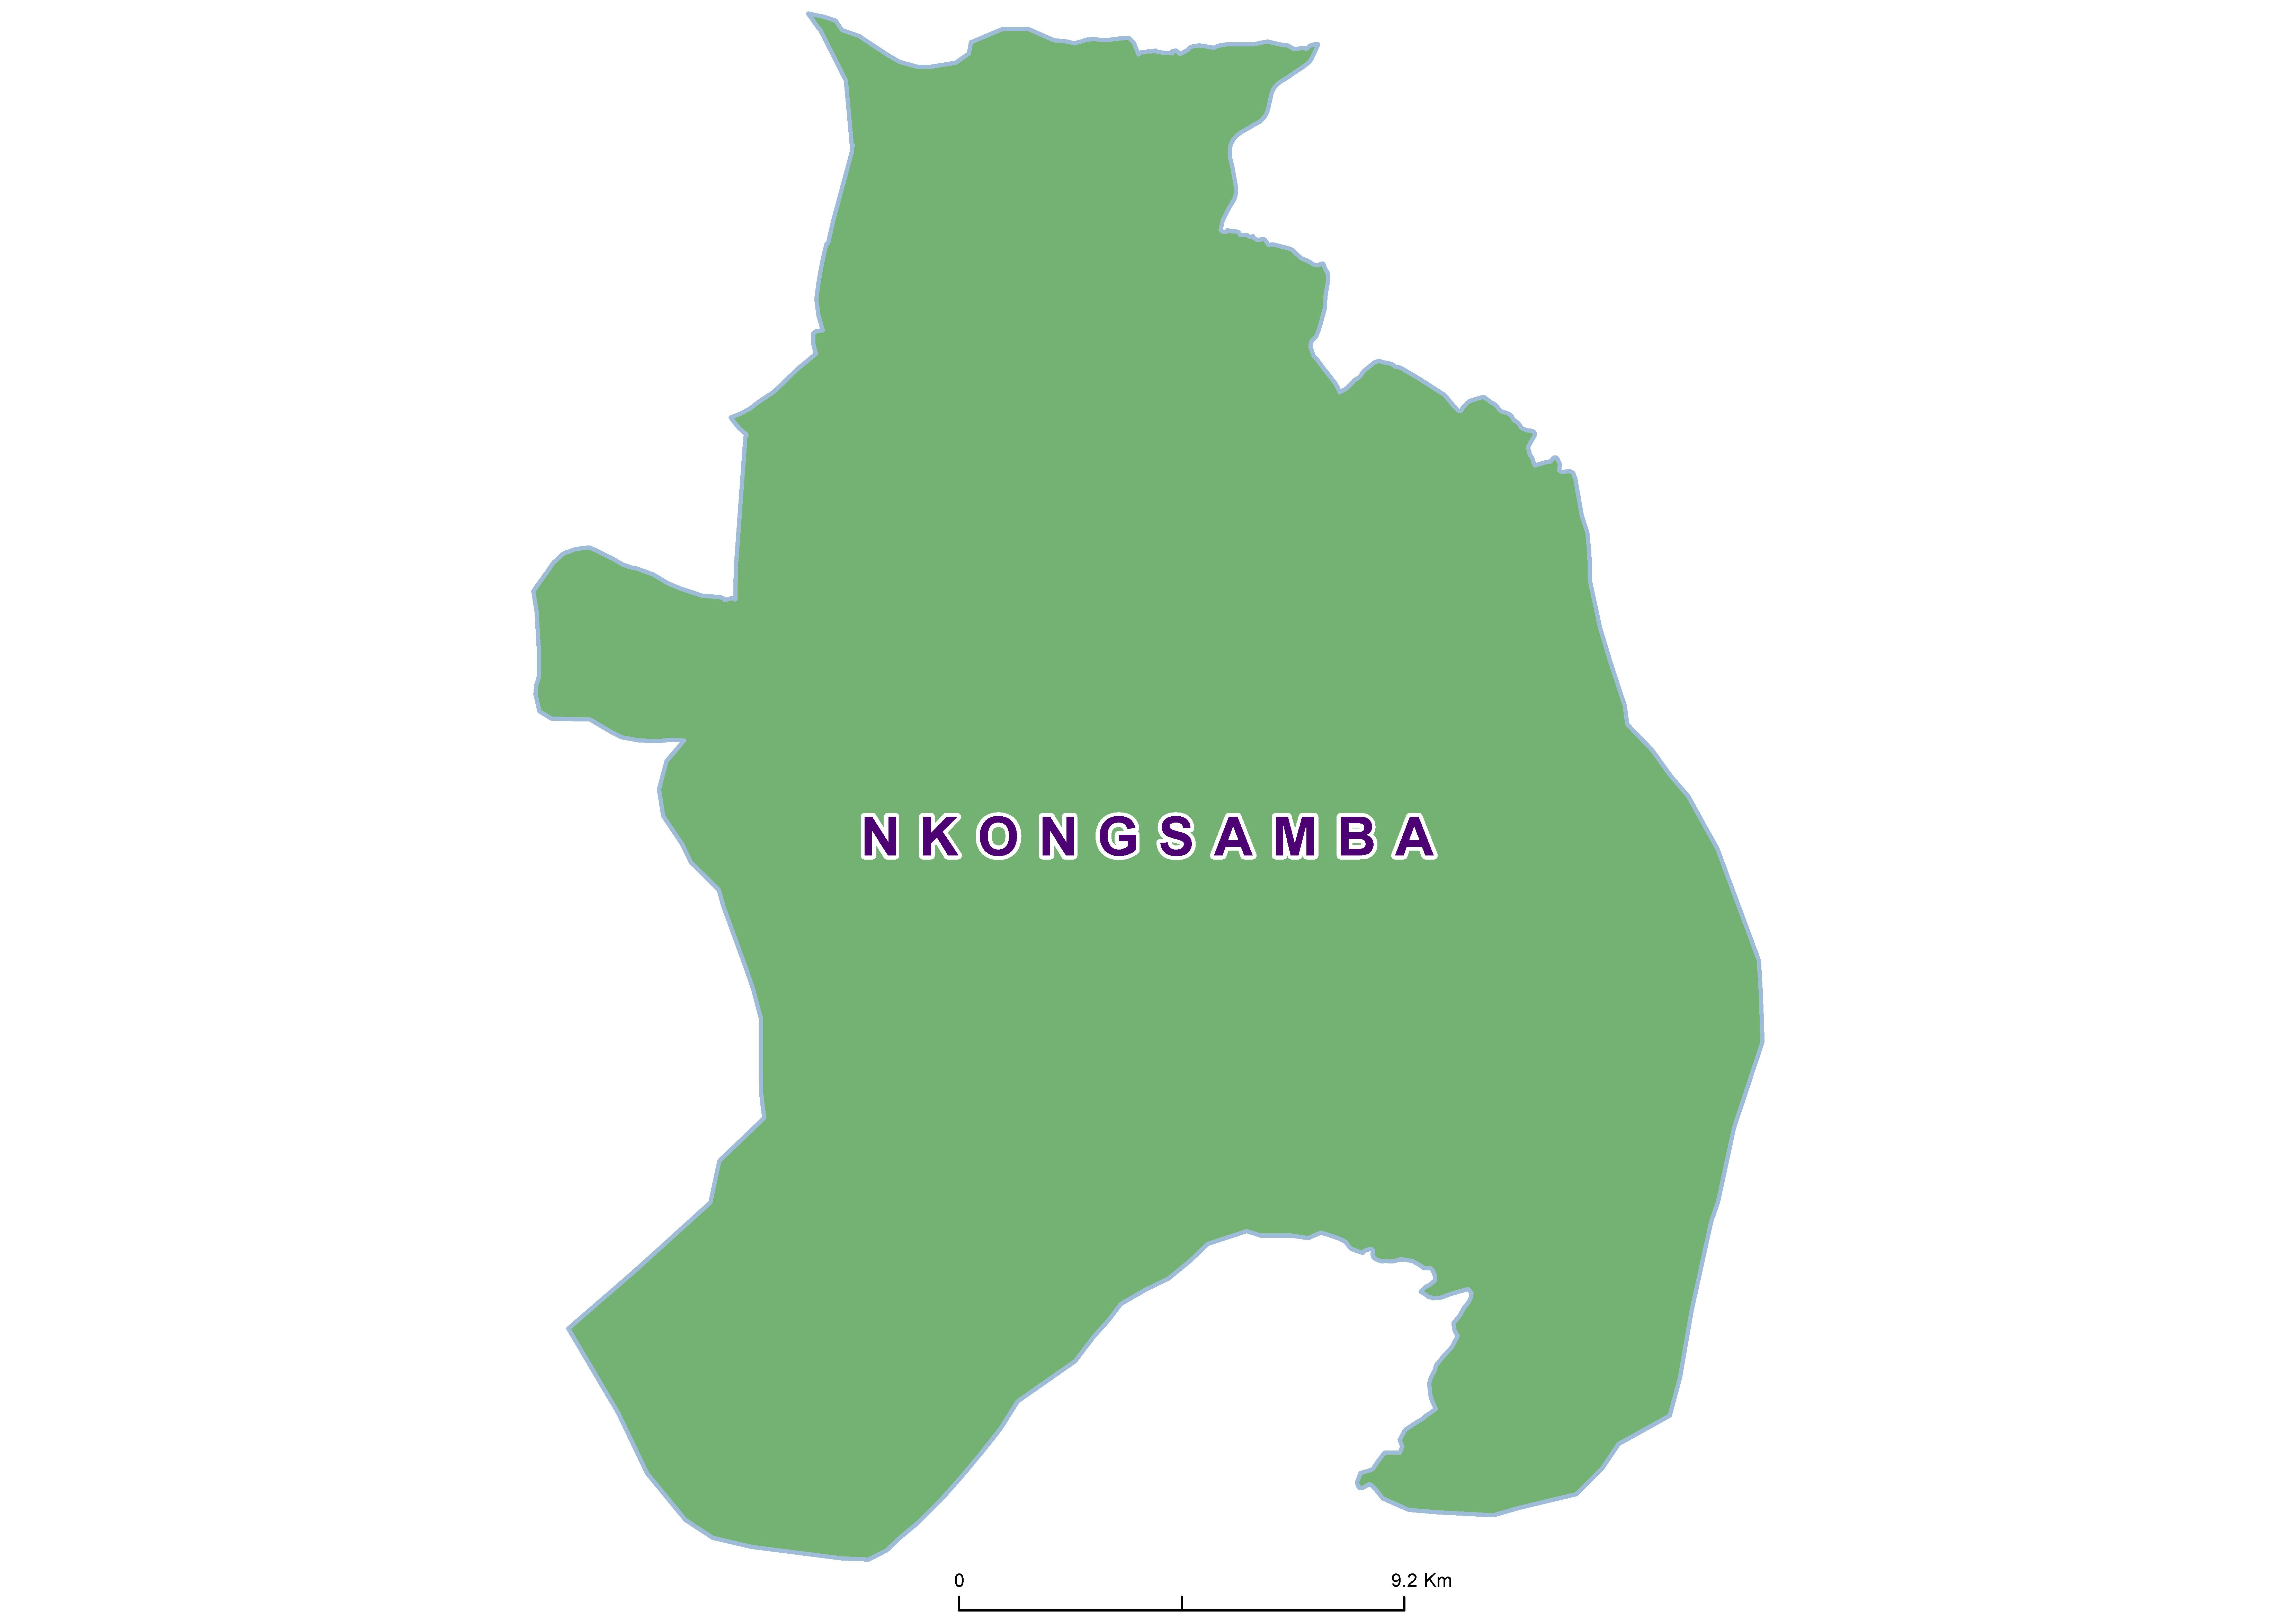 Nkongsamba Mean SCH 19850001